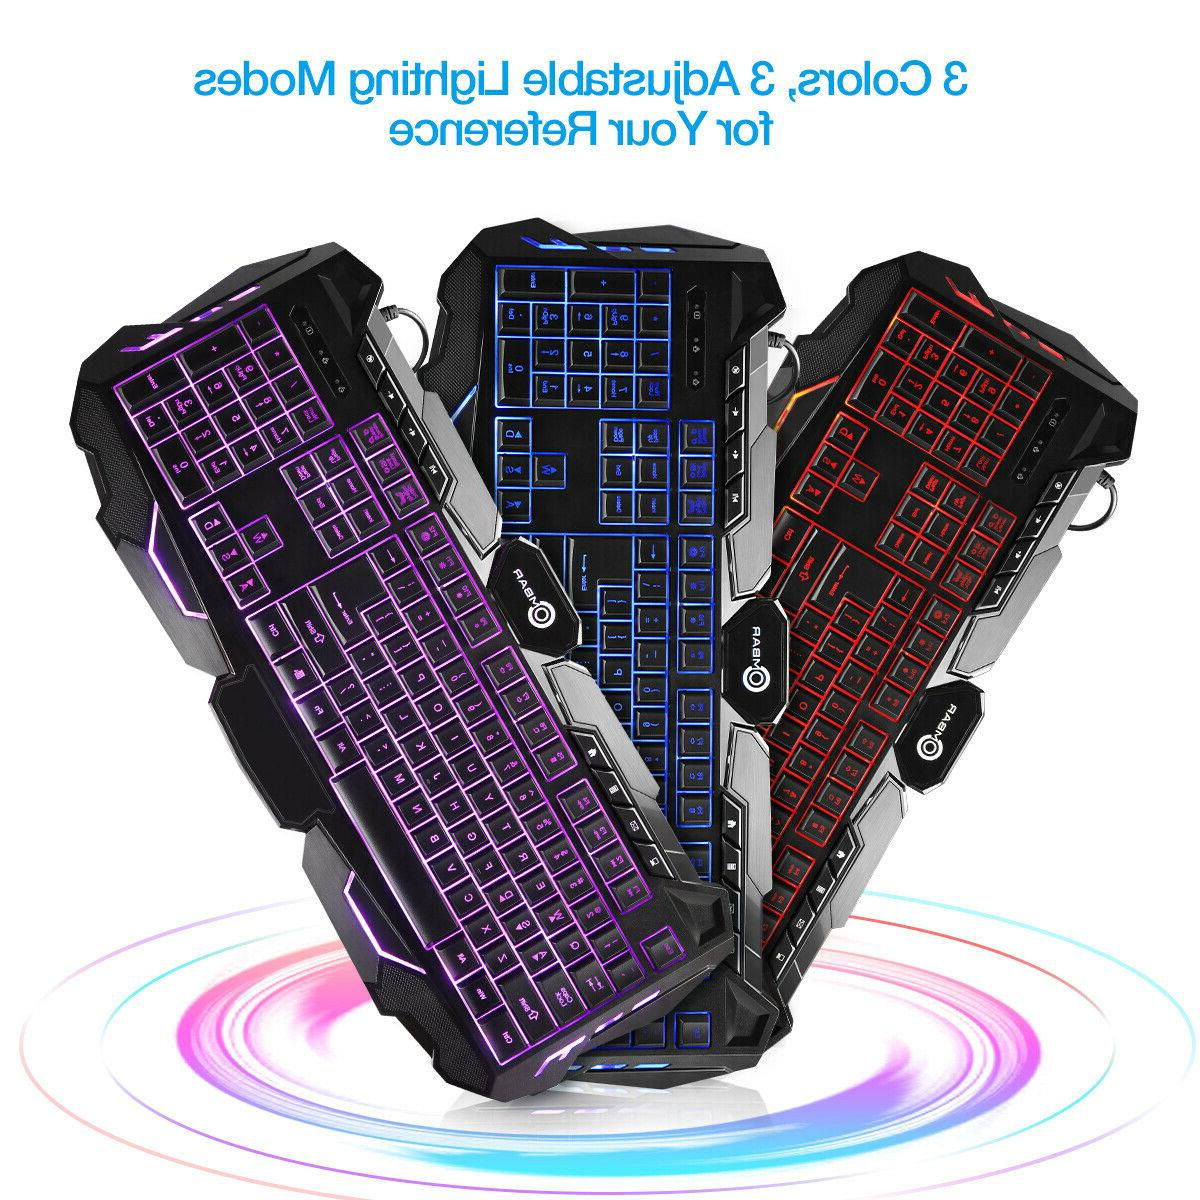 RGB Backlit Gaming Keyboard Adjustable Wired Illuminated +